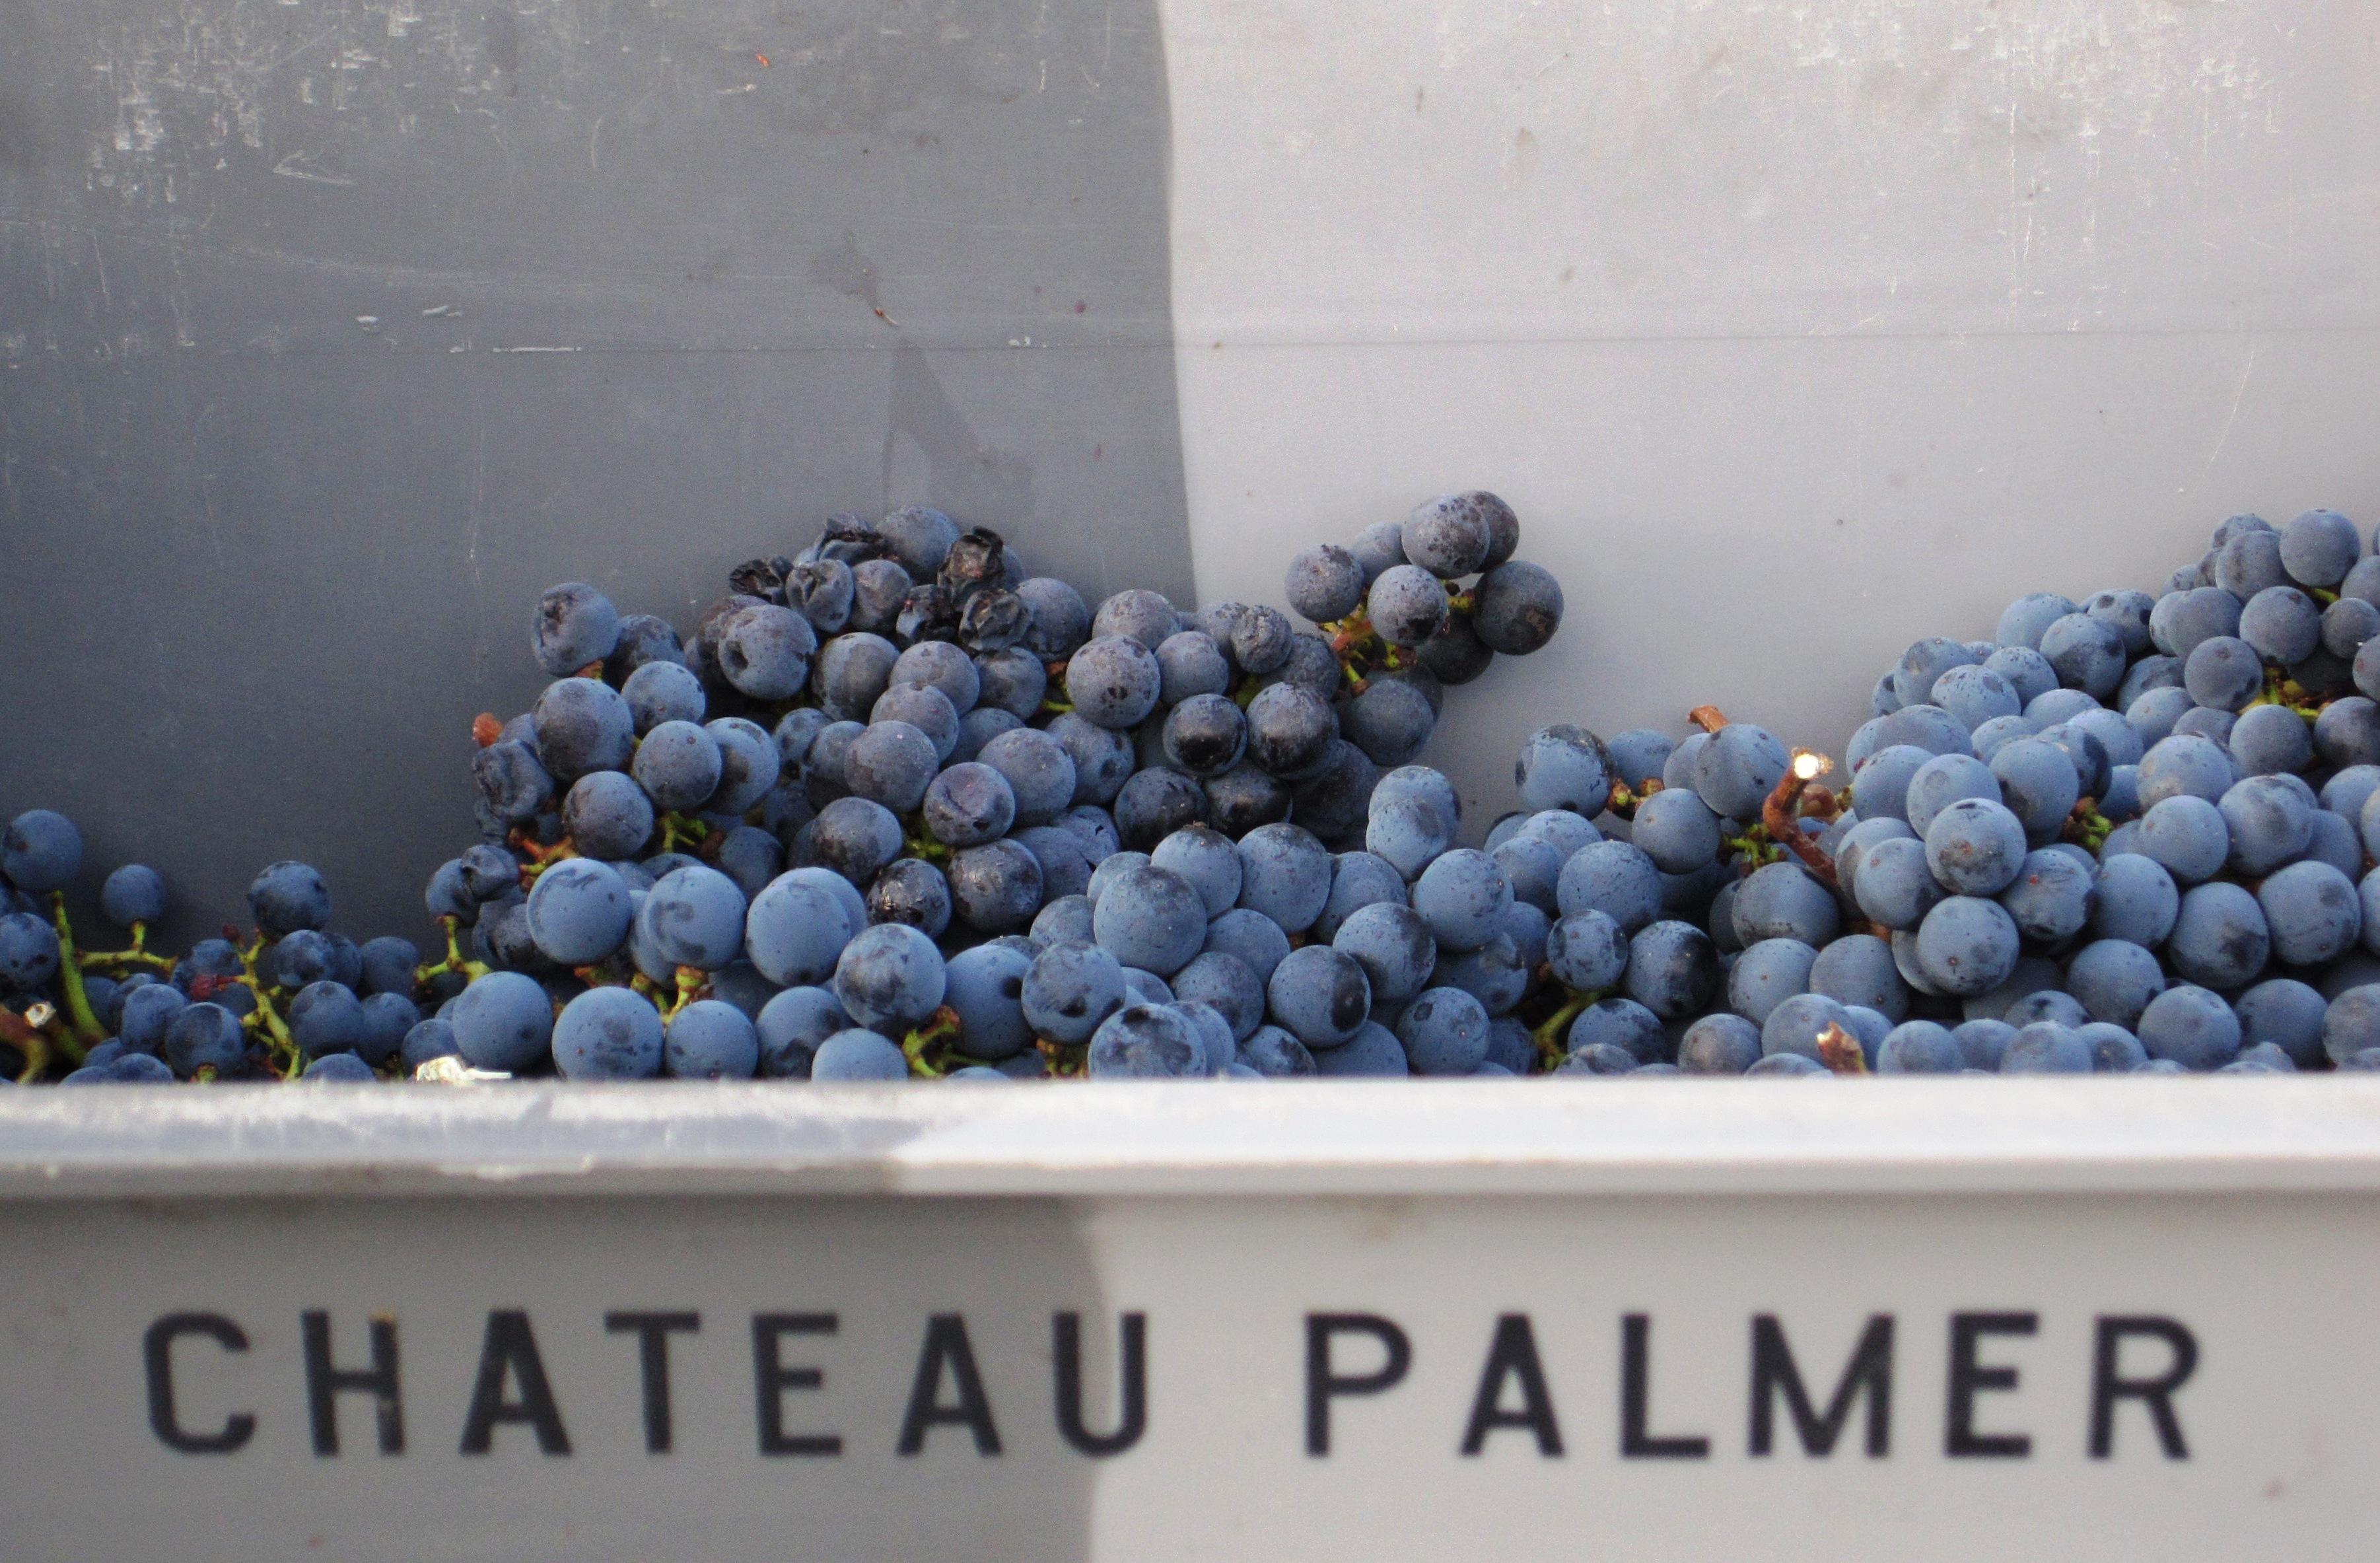 Chateau Palmer Alter Ego de Palmer 2010 Bordeaux Red Blends Wine Red Blends Wine